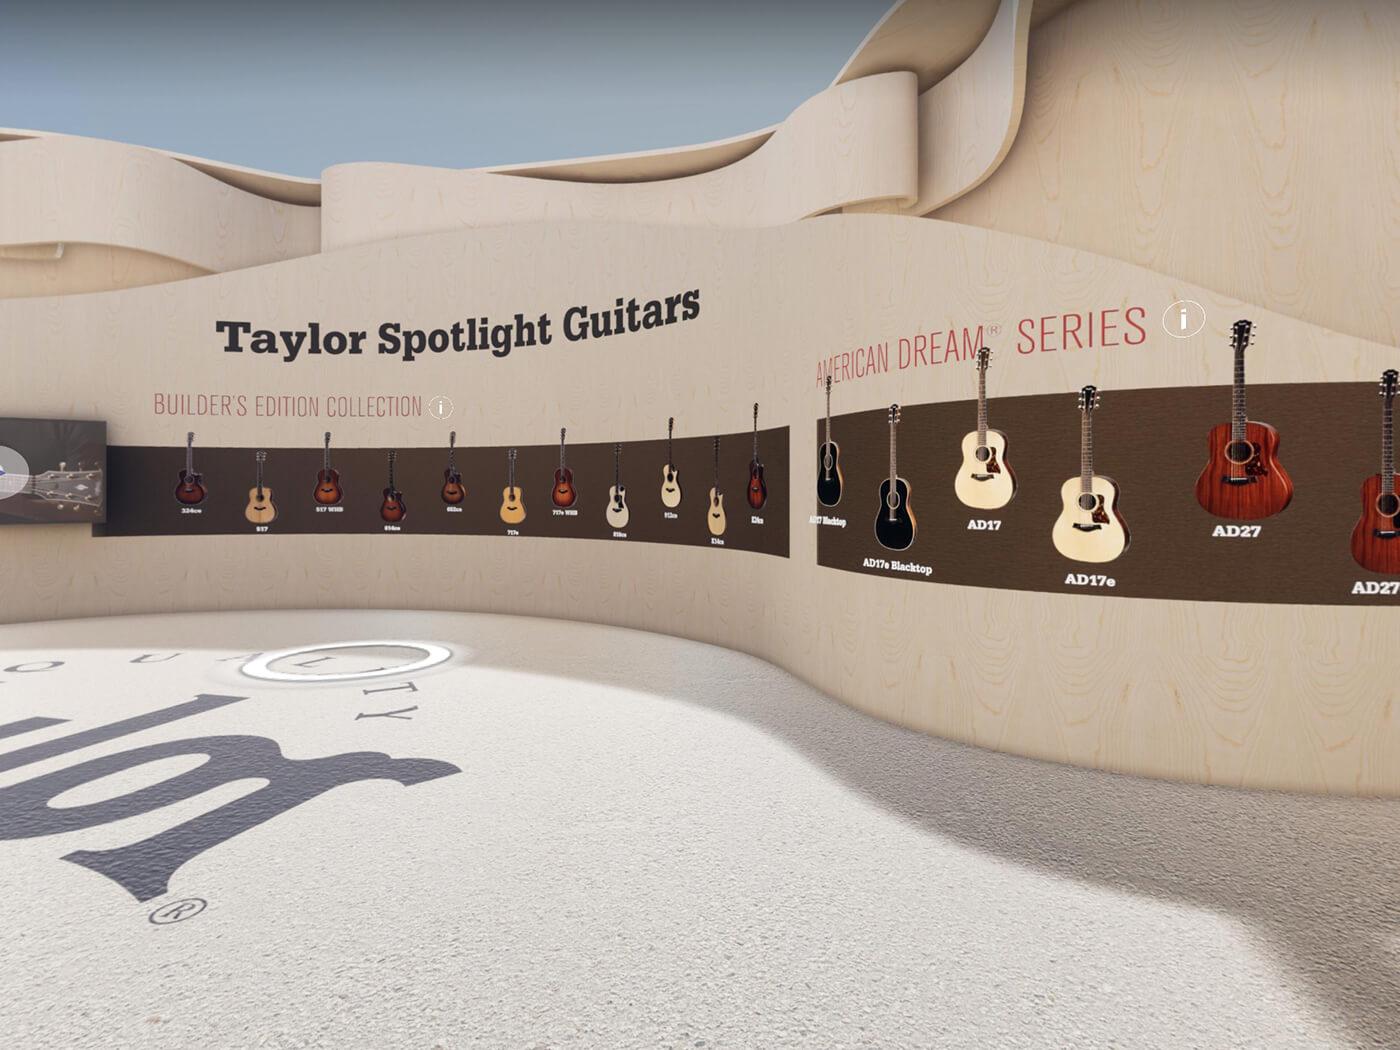 Taylor at Guitar.com Live Spotlight Guitars